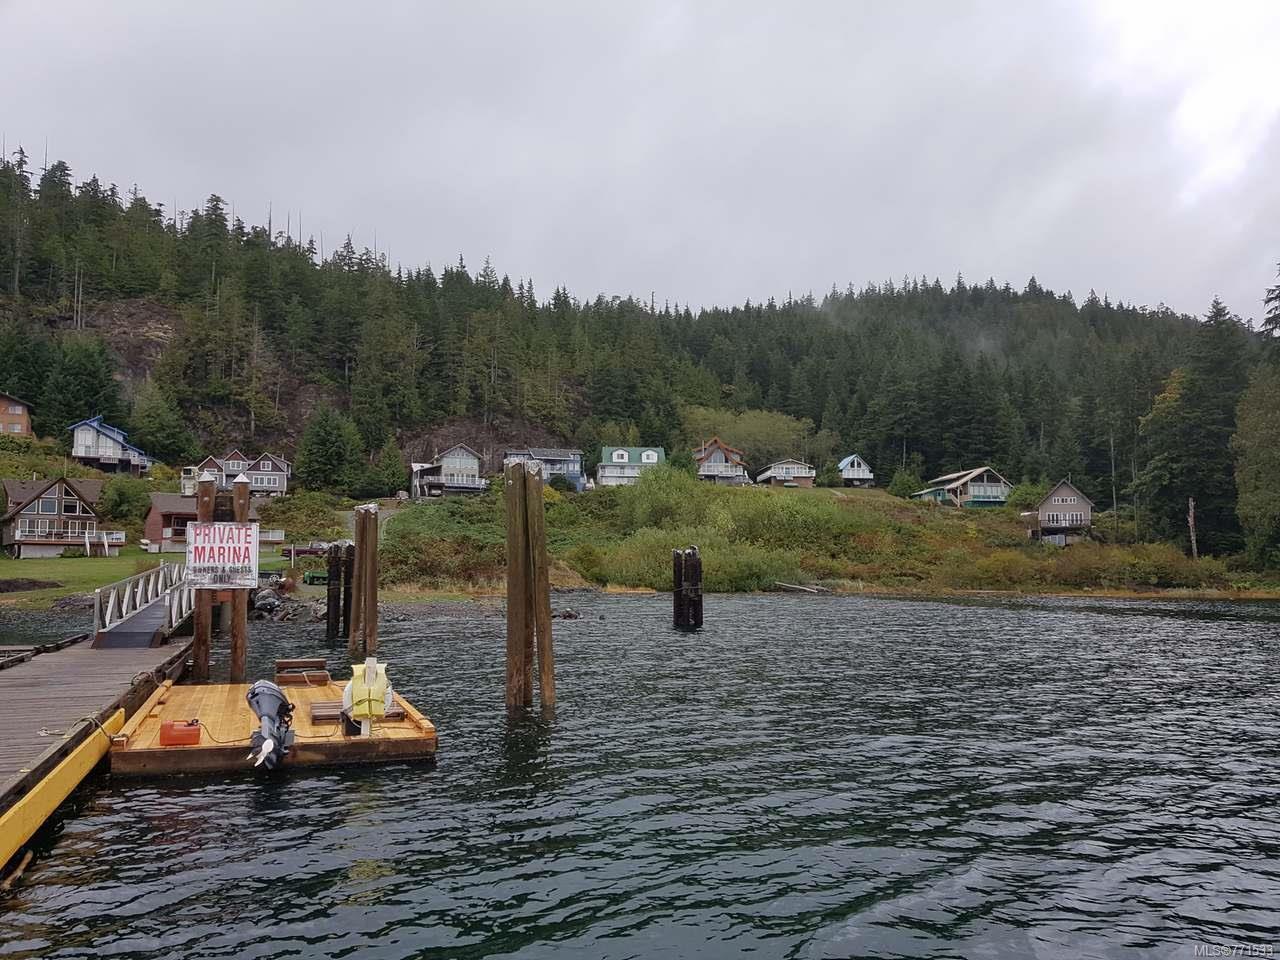 Main Photo: LT 20 Haggard Cove in PORT ALBERNI: PA Alberni Inlet Land for sale (Port Alberni)  : MLS®# 771533